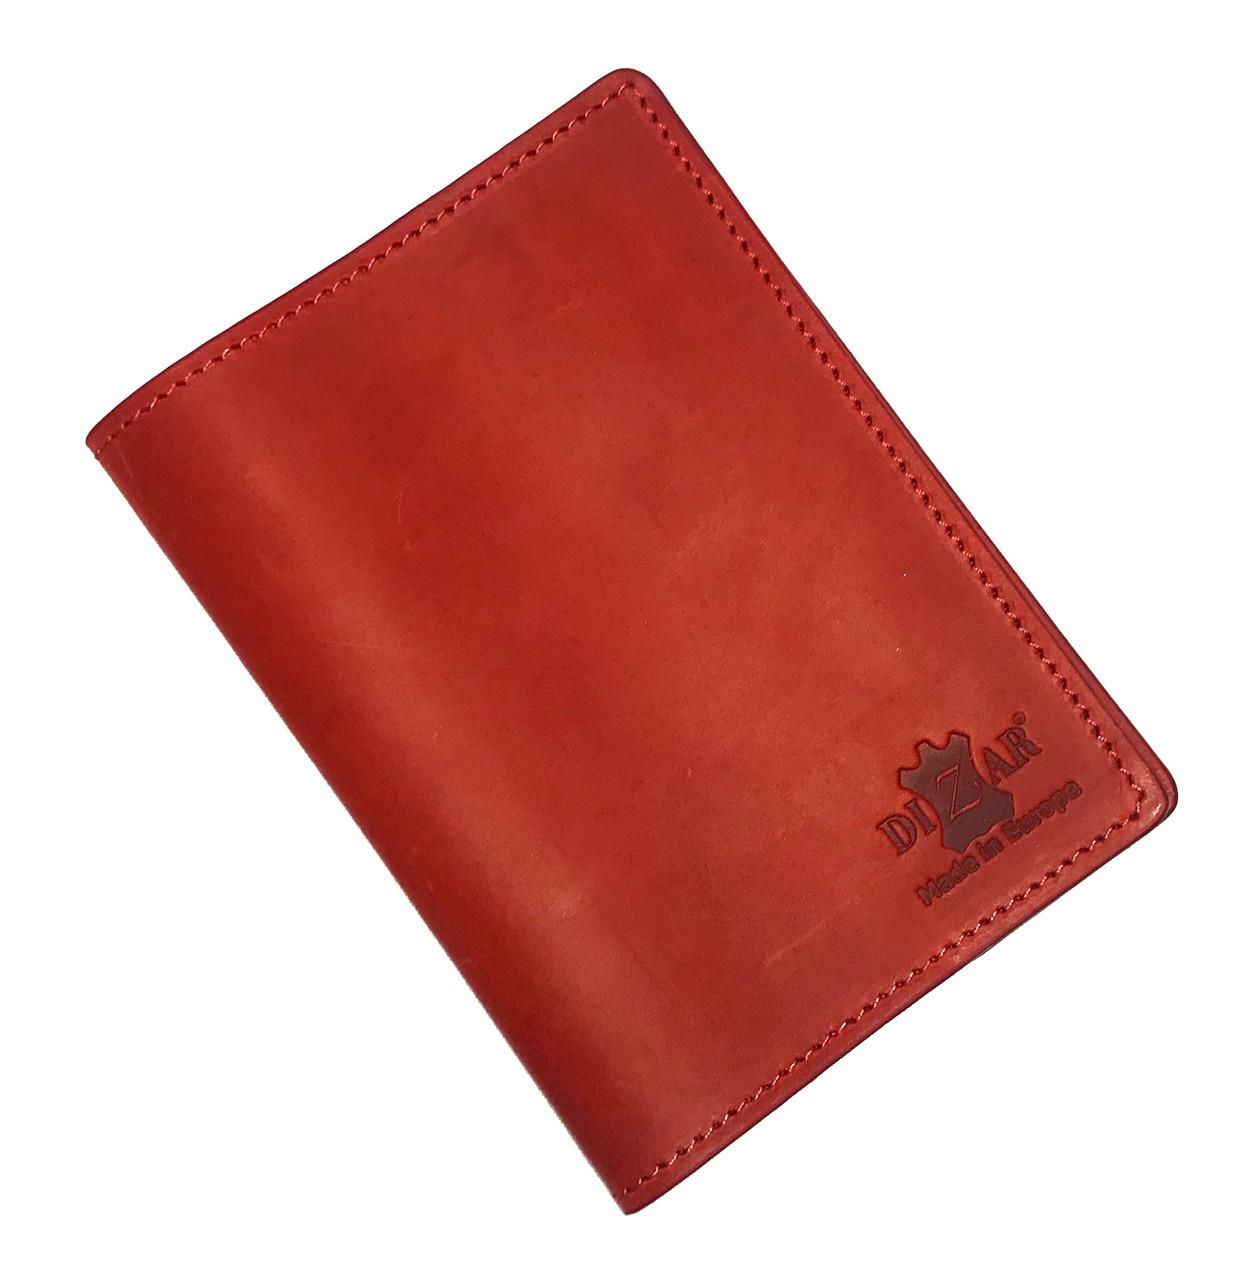 Обложка на паспорт Dizar кожа крейзи, красная